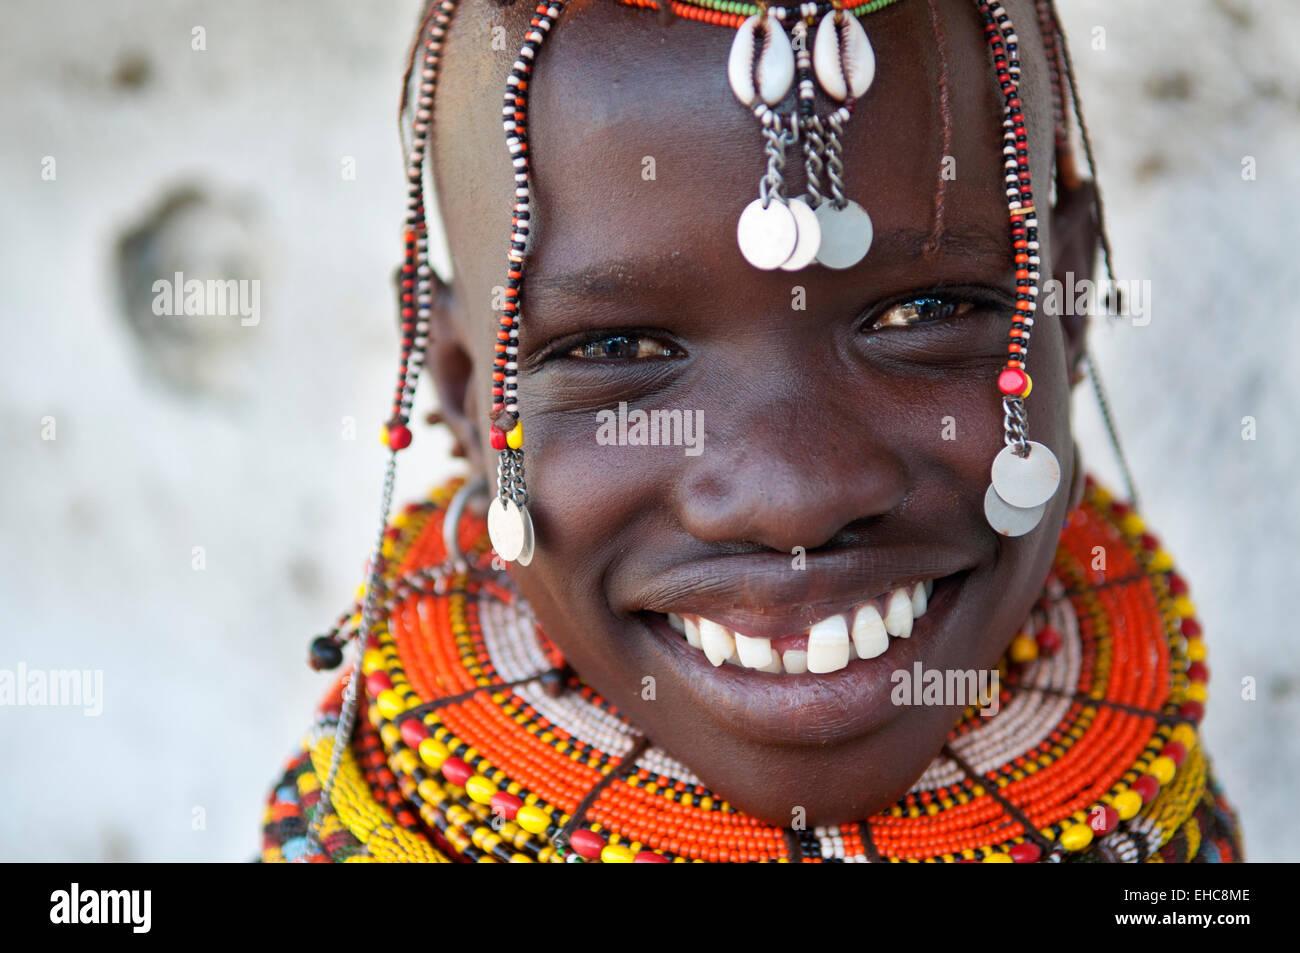 Smiling Turkana girl with massive colorful beaded necklaces and headdress, Loiyangalani, Kenya - Stock Image